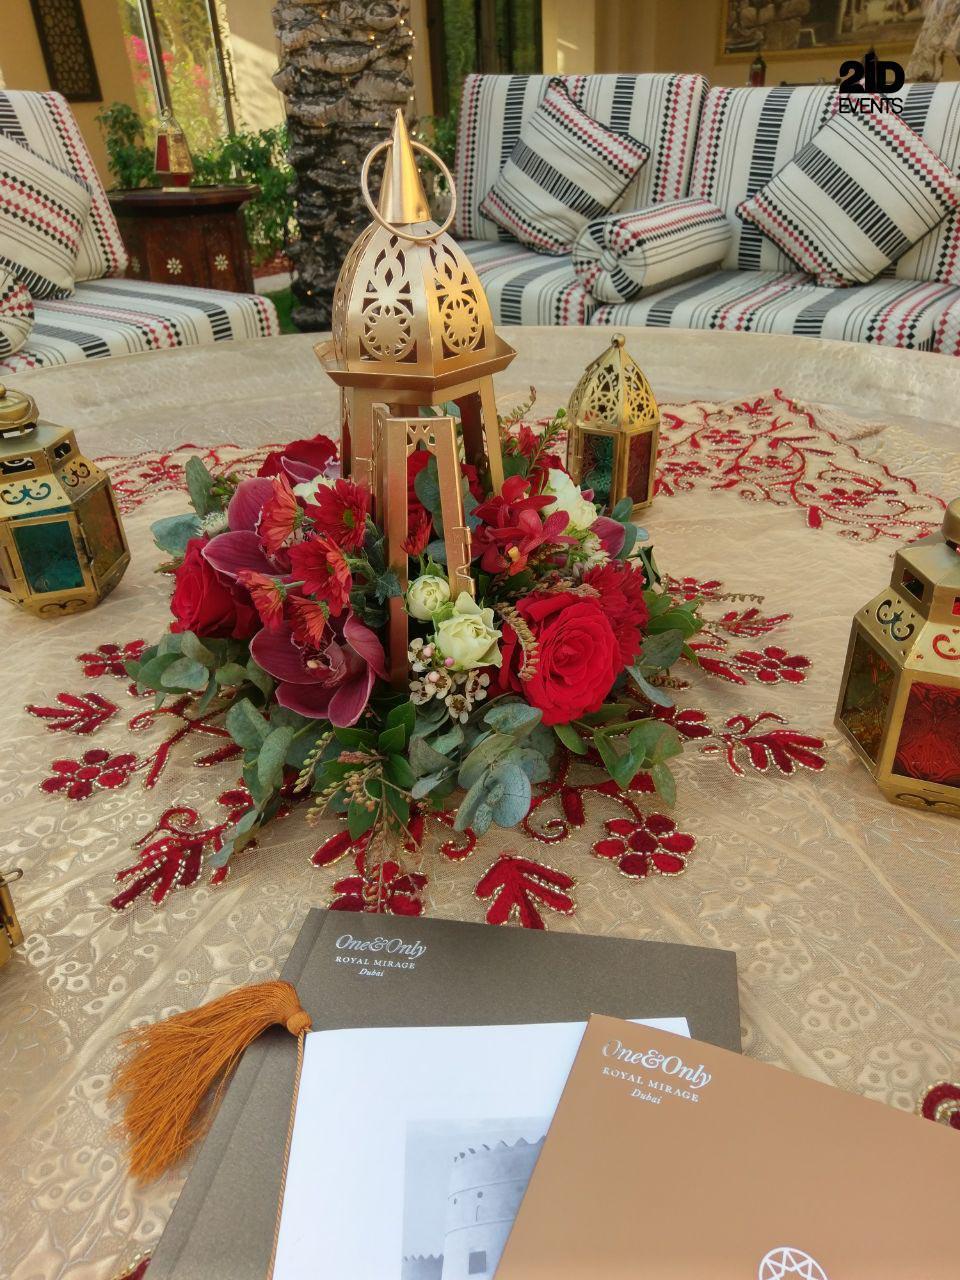 6 - ARABIAN STYLE DECOR FOR CORPORATE EVENT